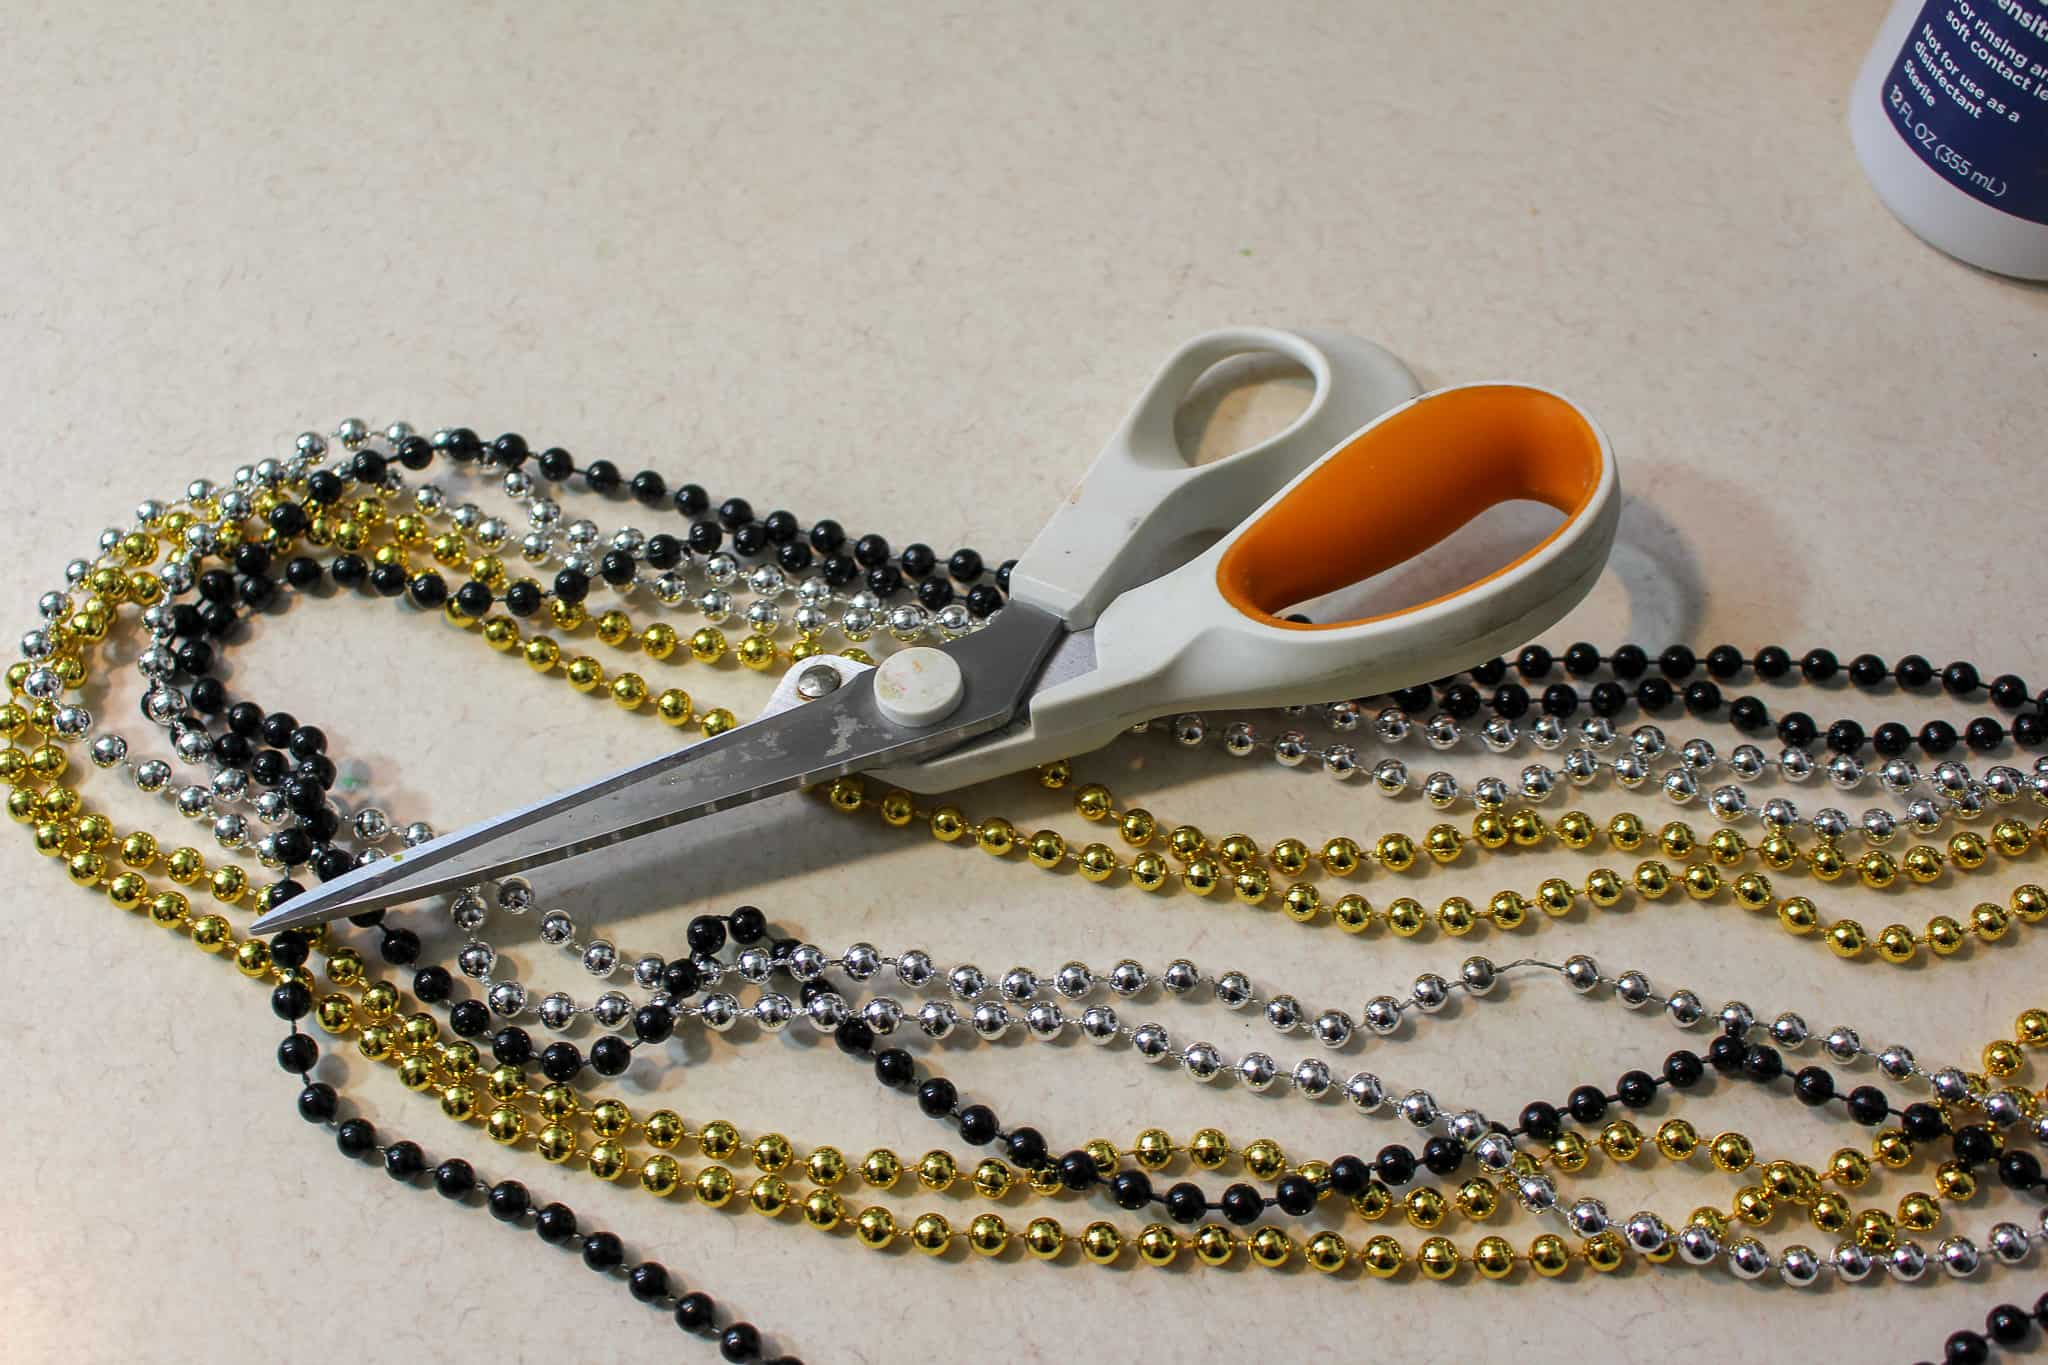 beads and scissors